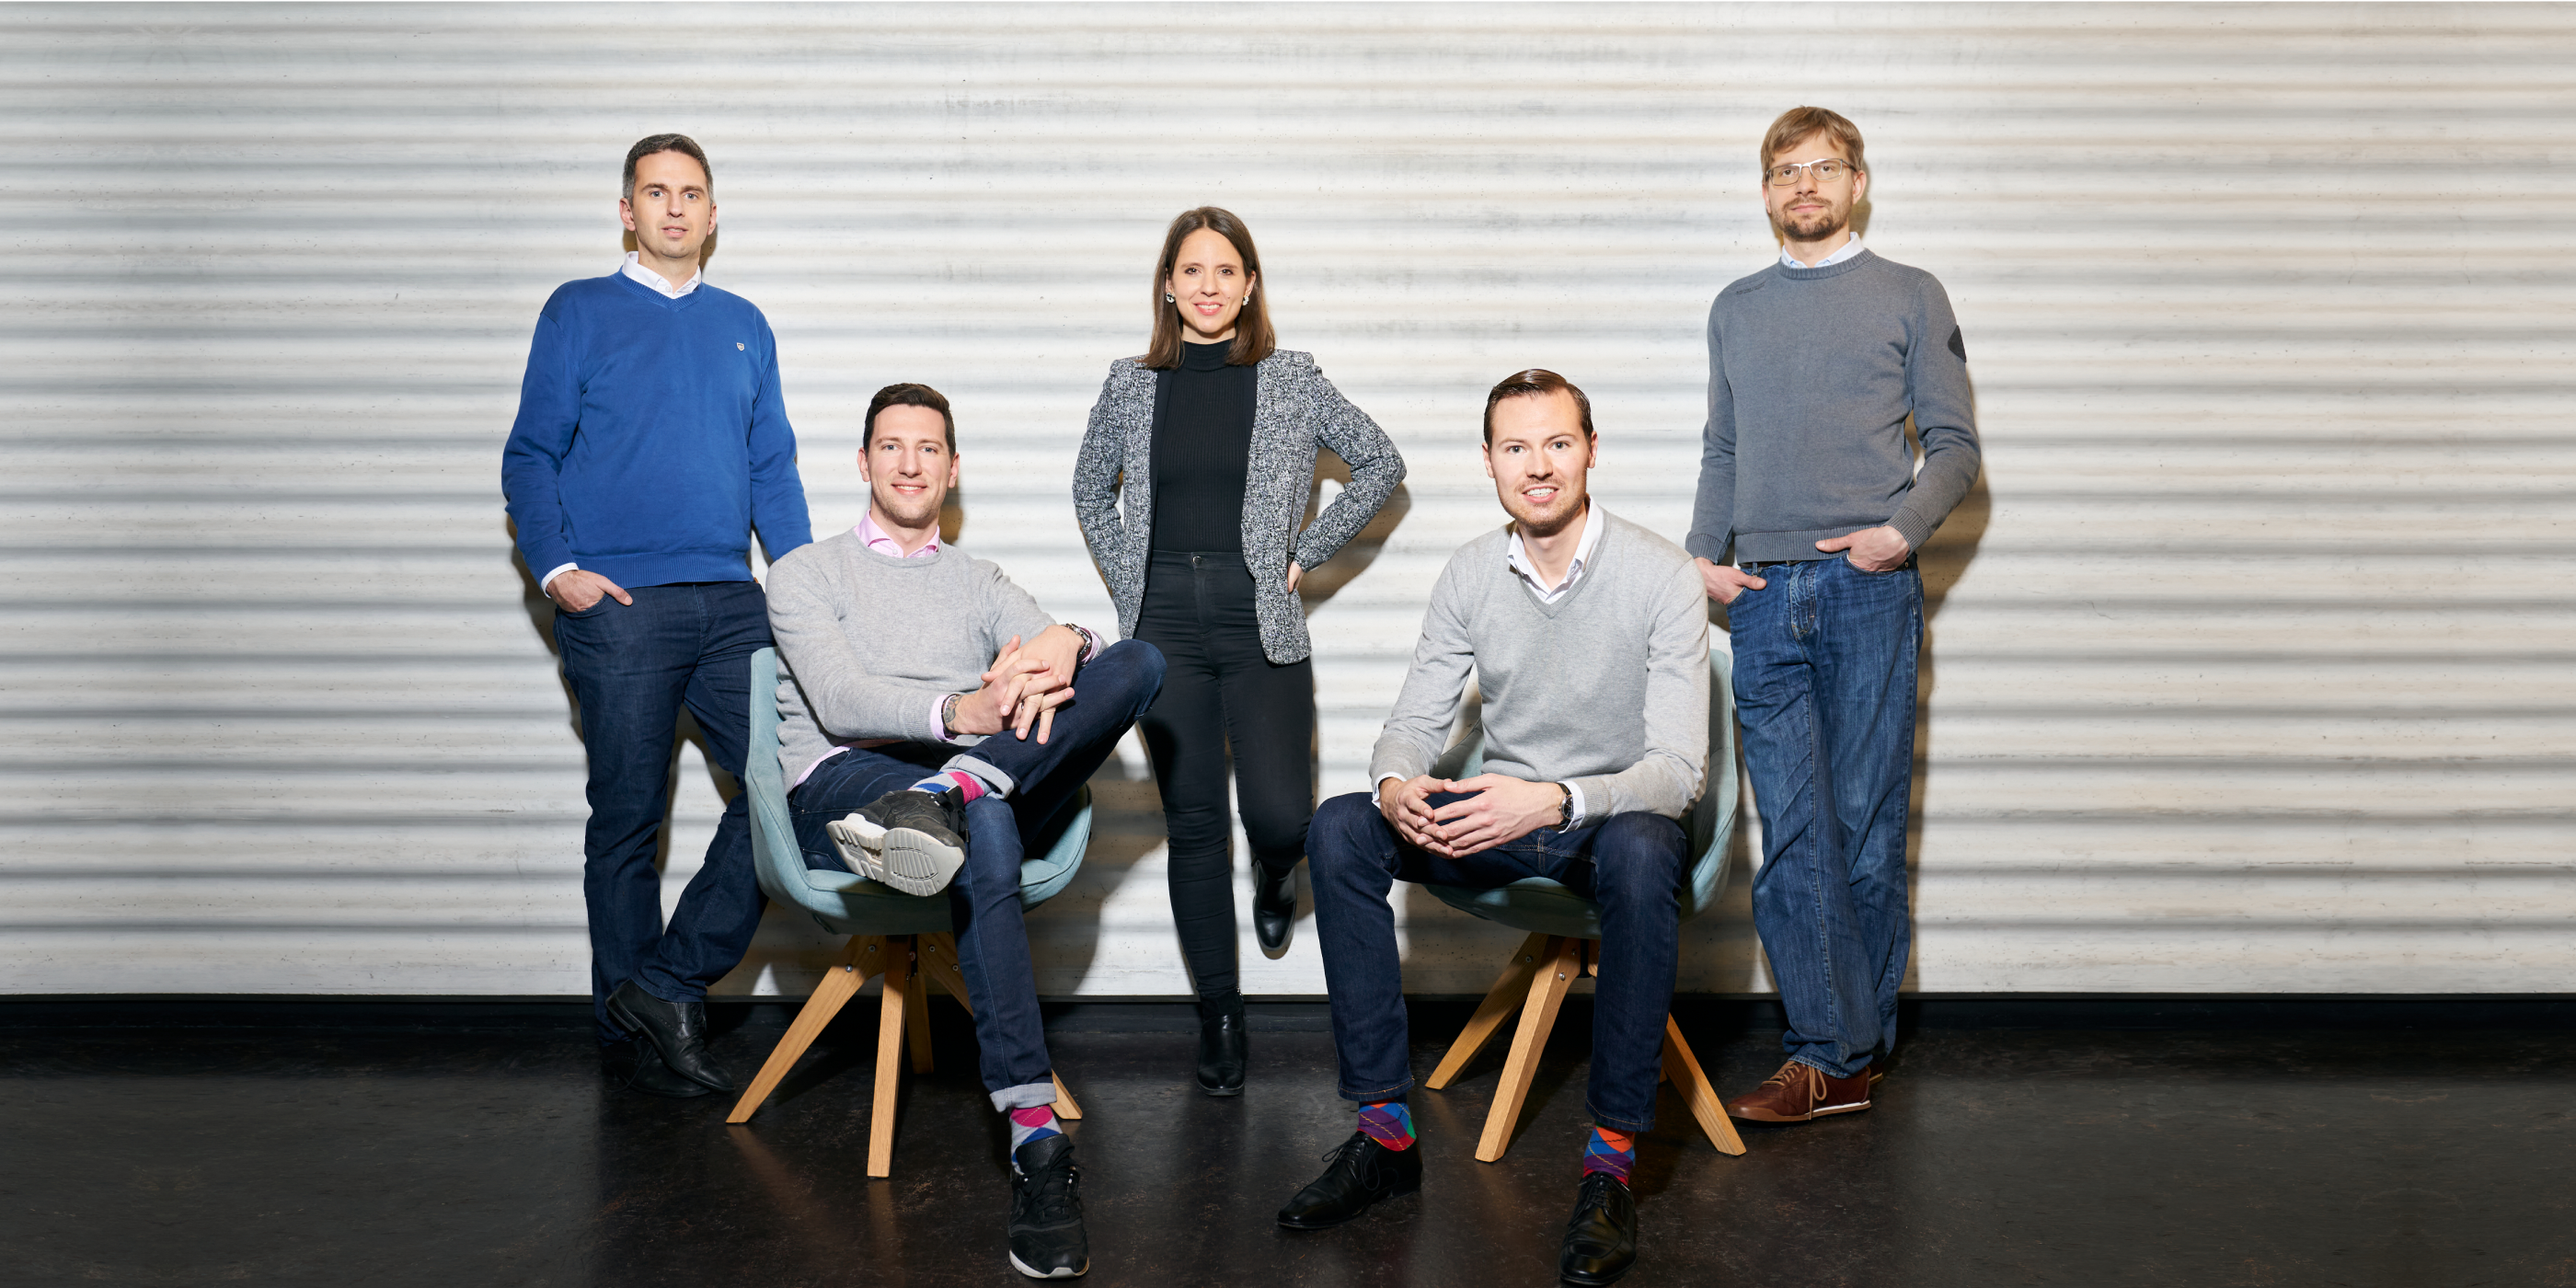 The co-founders of Yokoy: Thomas Inhelder, Lars Mangelsdorf, Melanie Gabriel, Philippe Sahli, Devis Lussi